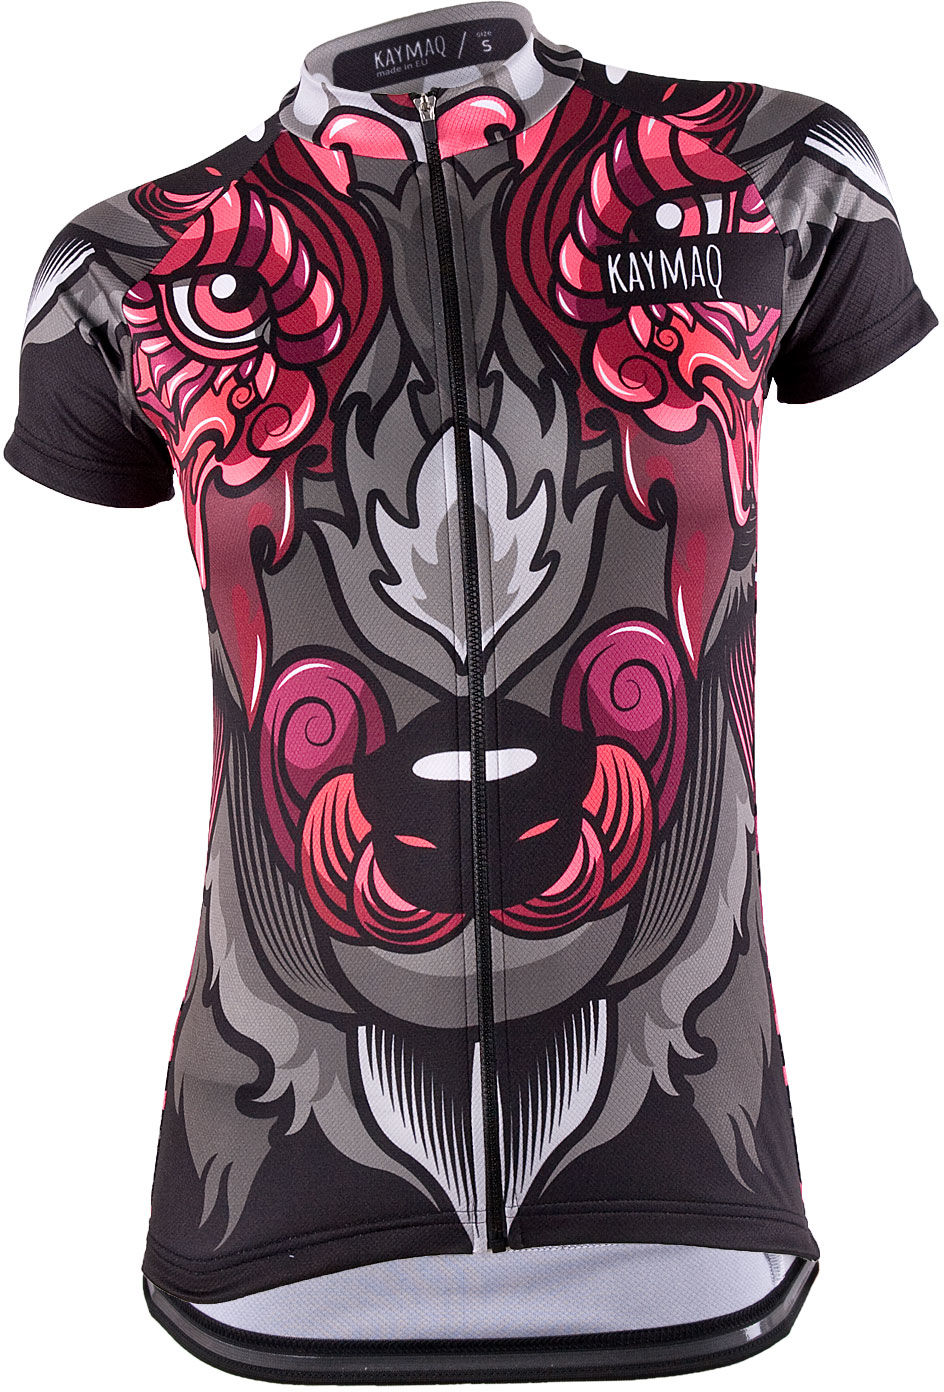 KAYMAQ WOLF damska koszulka rowerowa Rozmiar: M,KY-Wolf-short